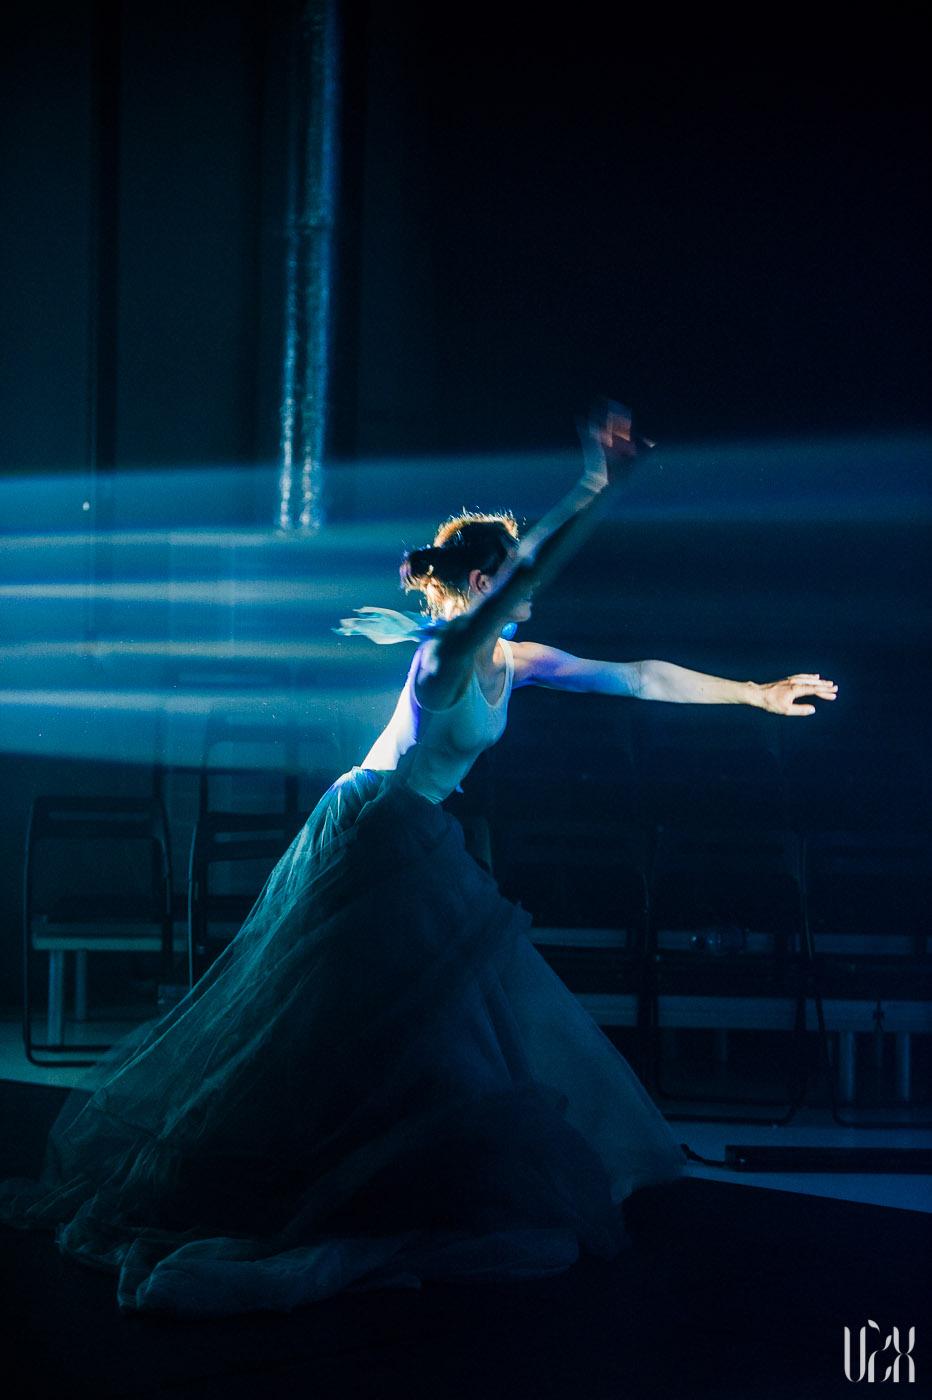 E.sabaliauskaite Vzx.lt Faustas Teatras Event 002